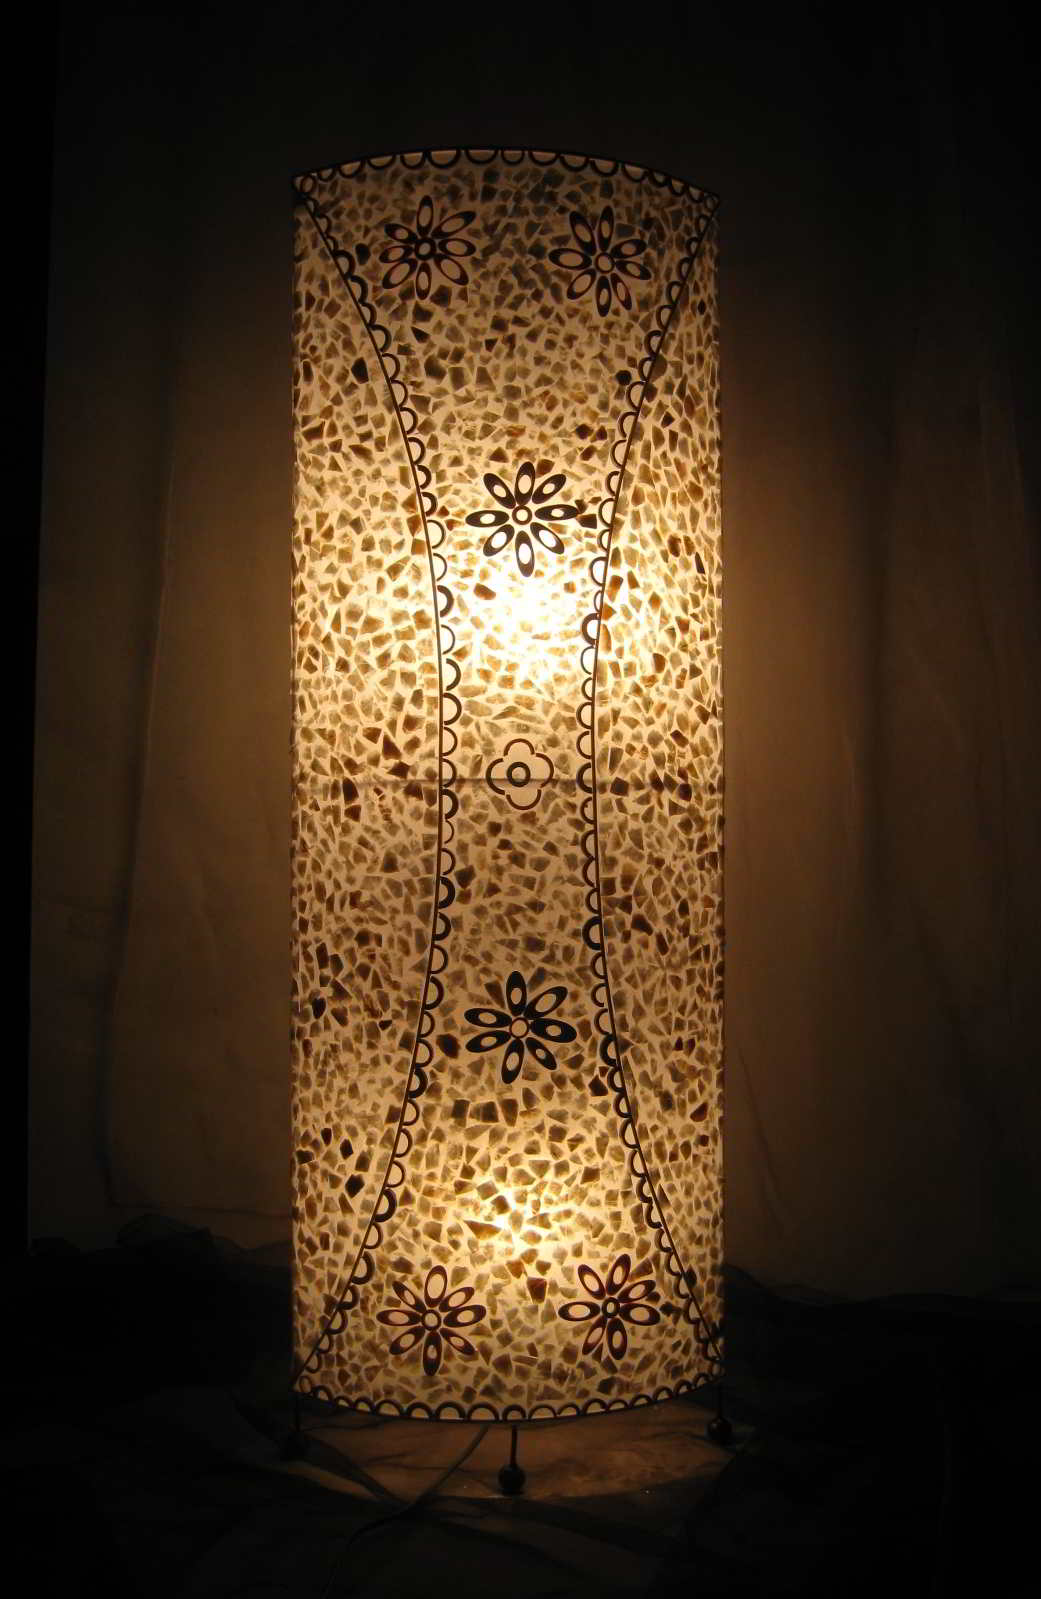 Lampade design,lampade da arredo,lampade moderne, abat jour design ...